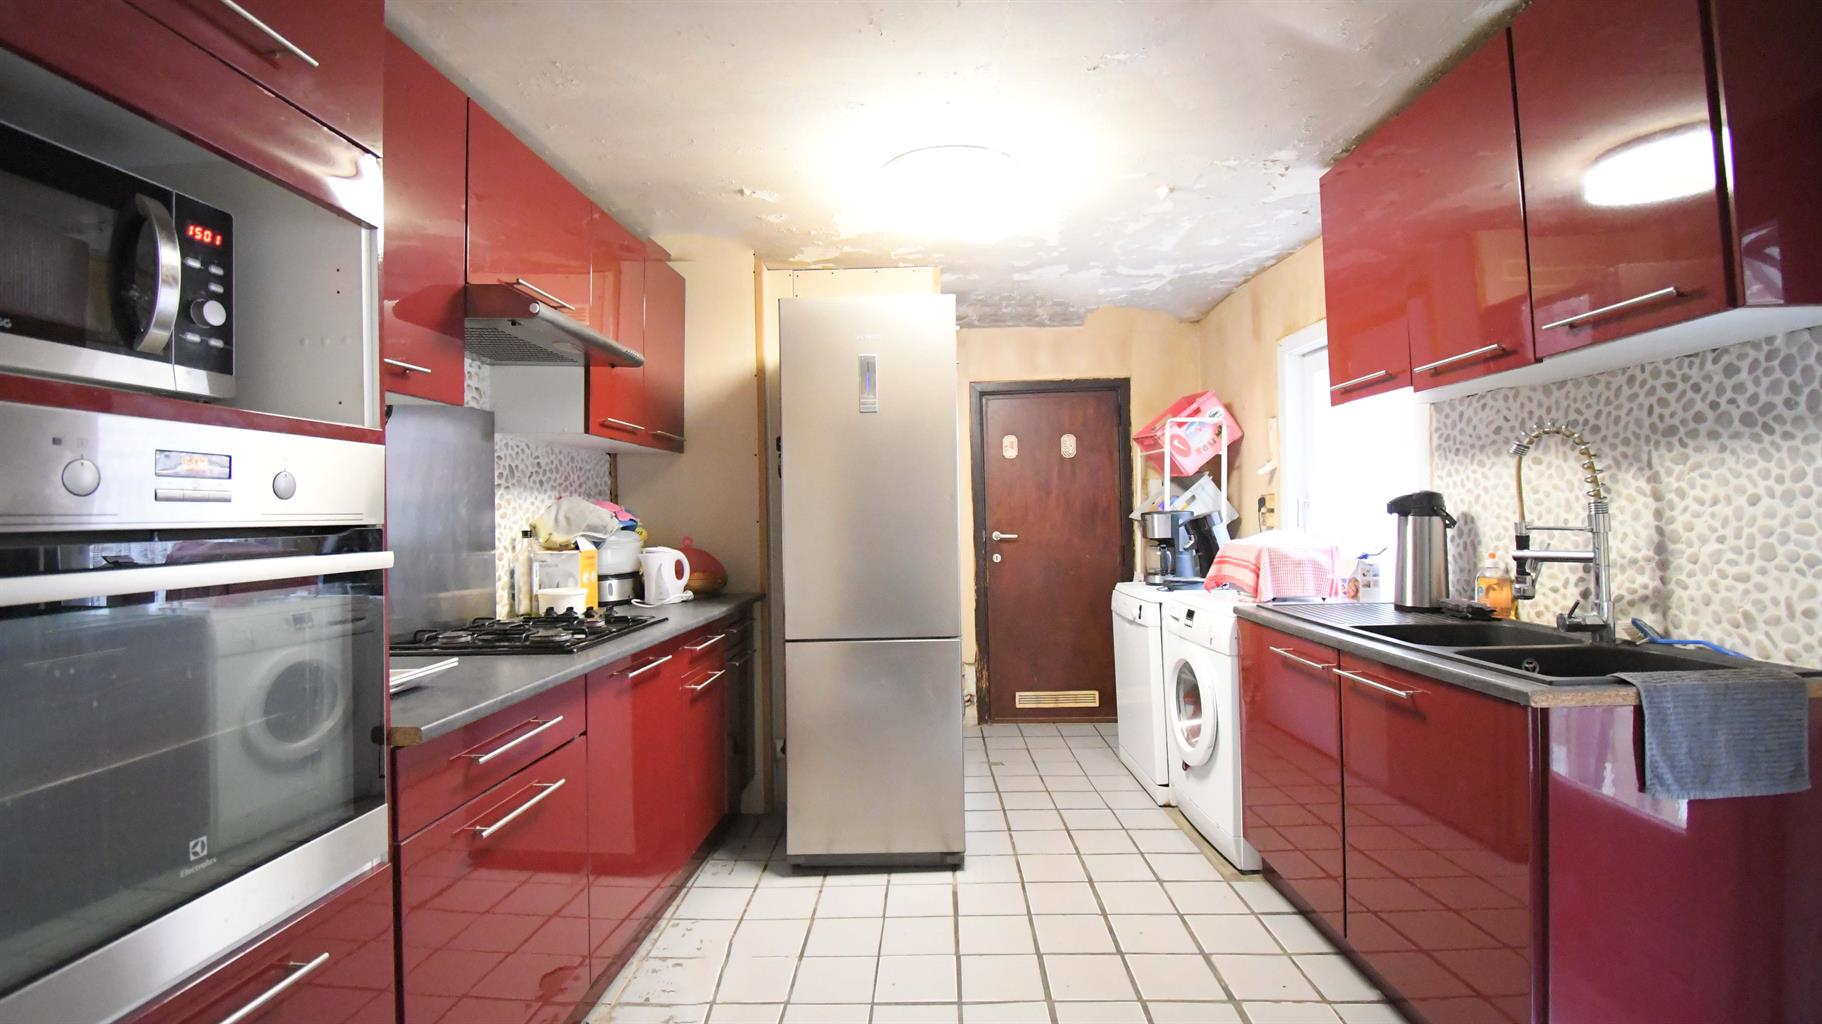 Maison - Rebecq - #4098960-6